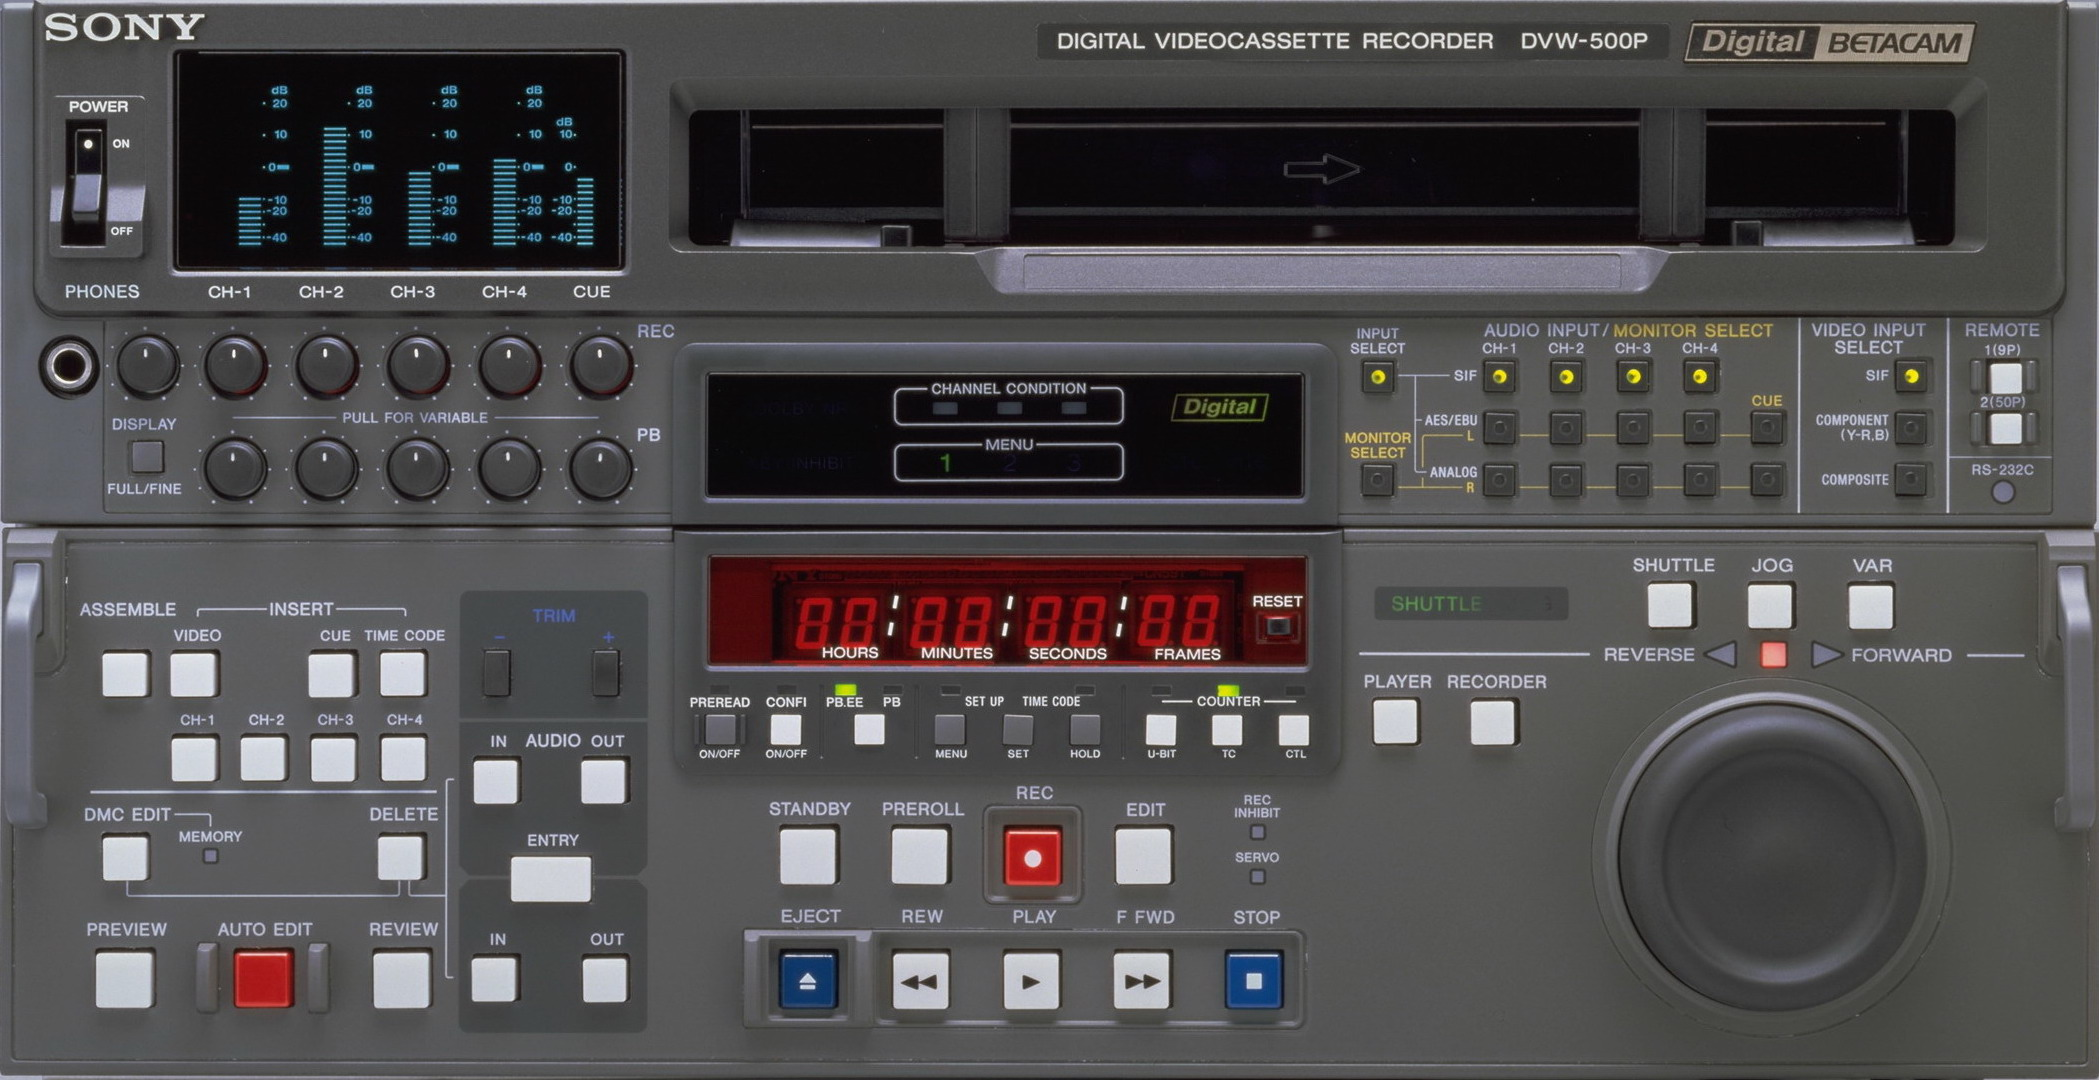 Sony DVW-A500P PAL Digital Betacam Mastering Deck.